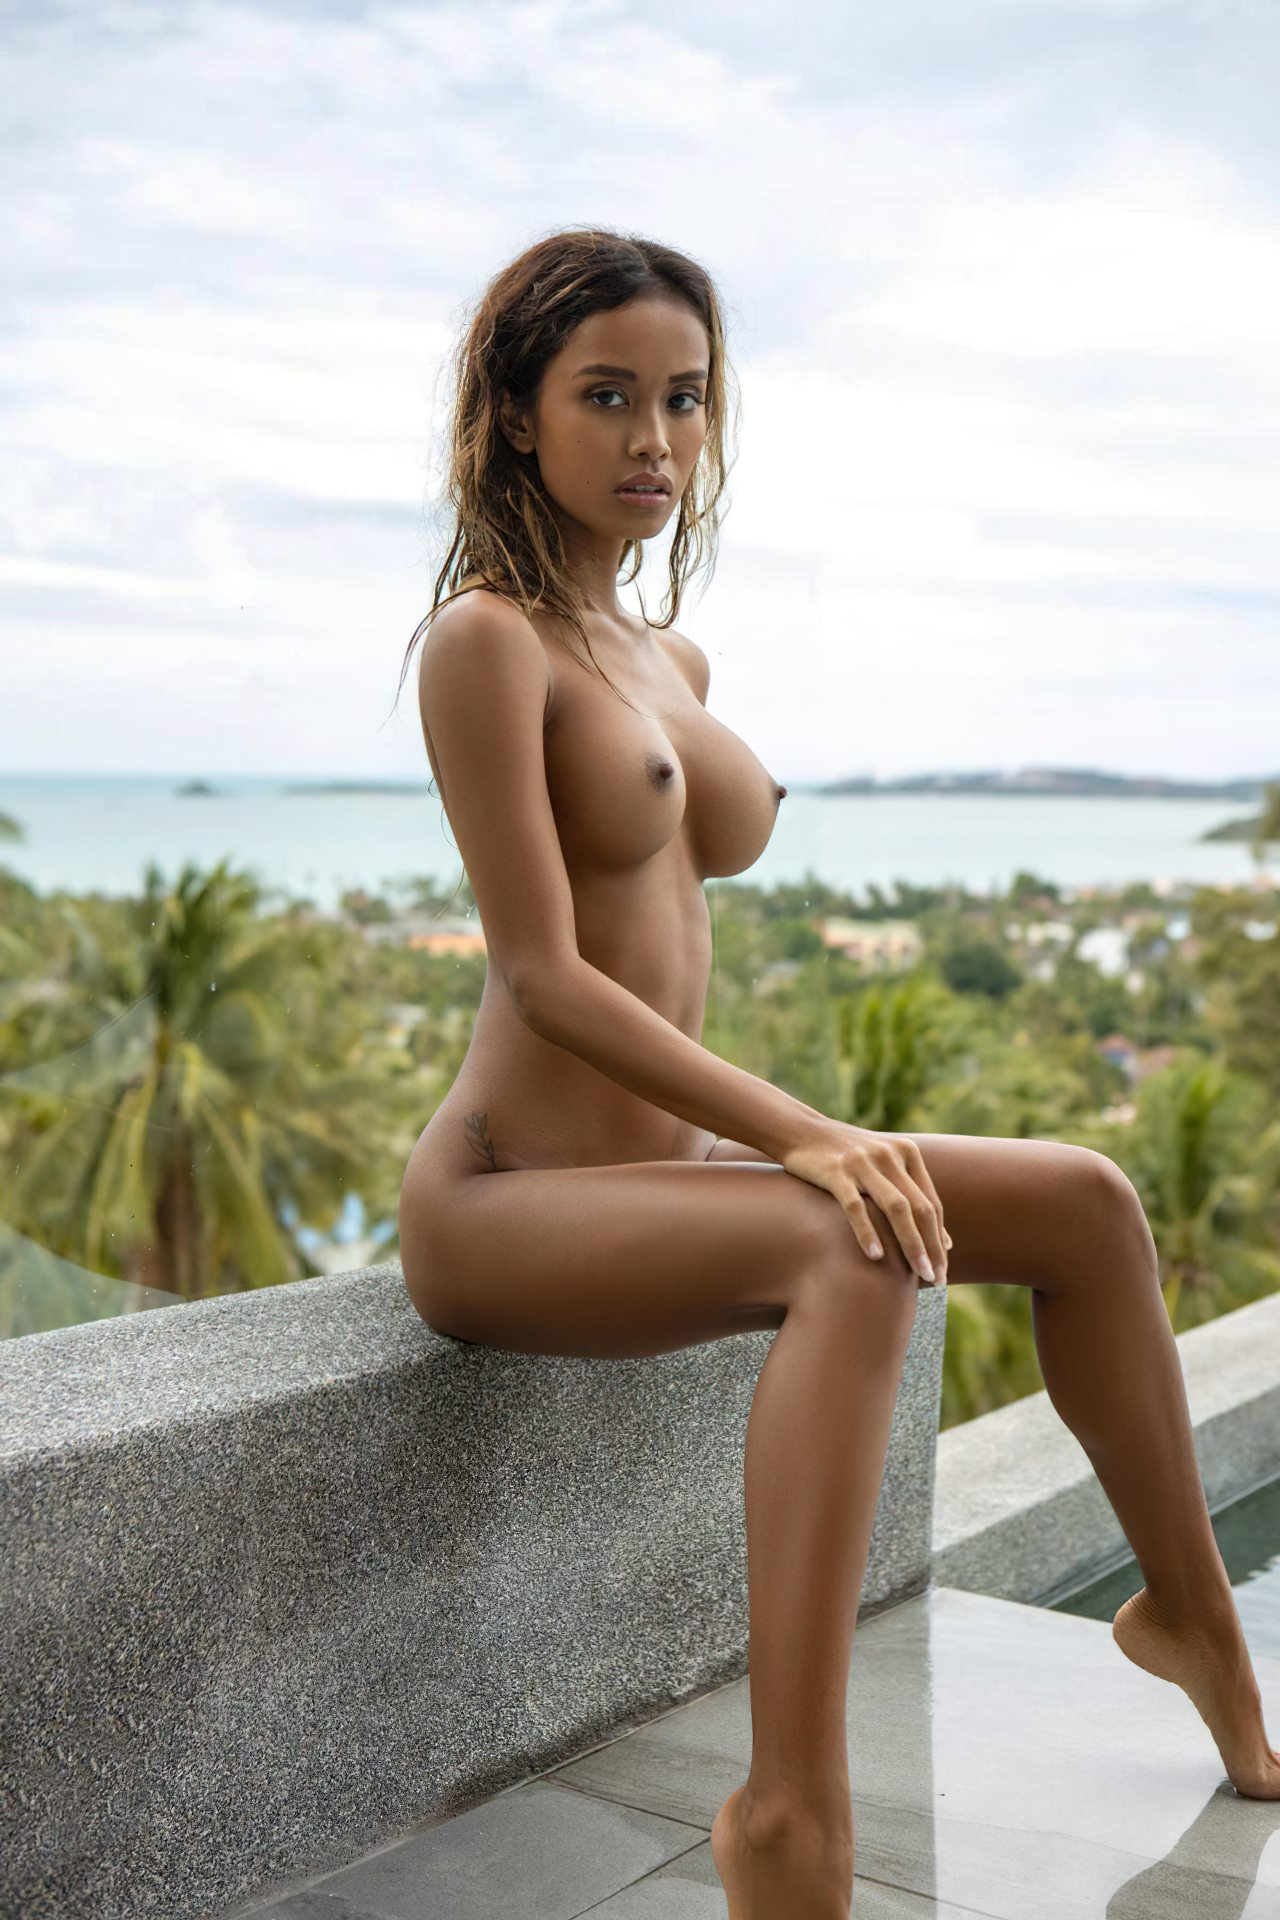 Mulheres Despidas (27)